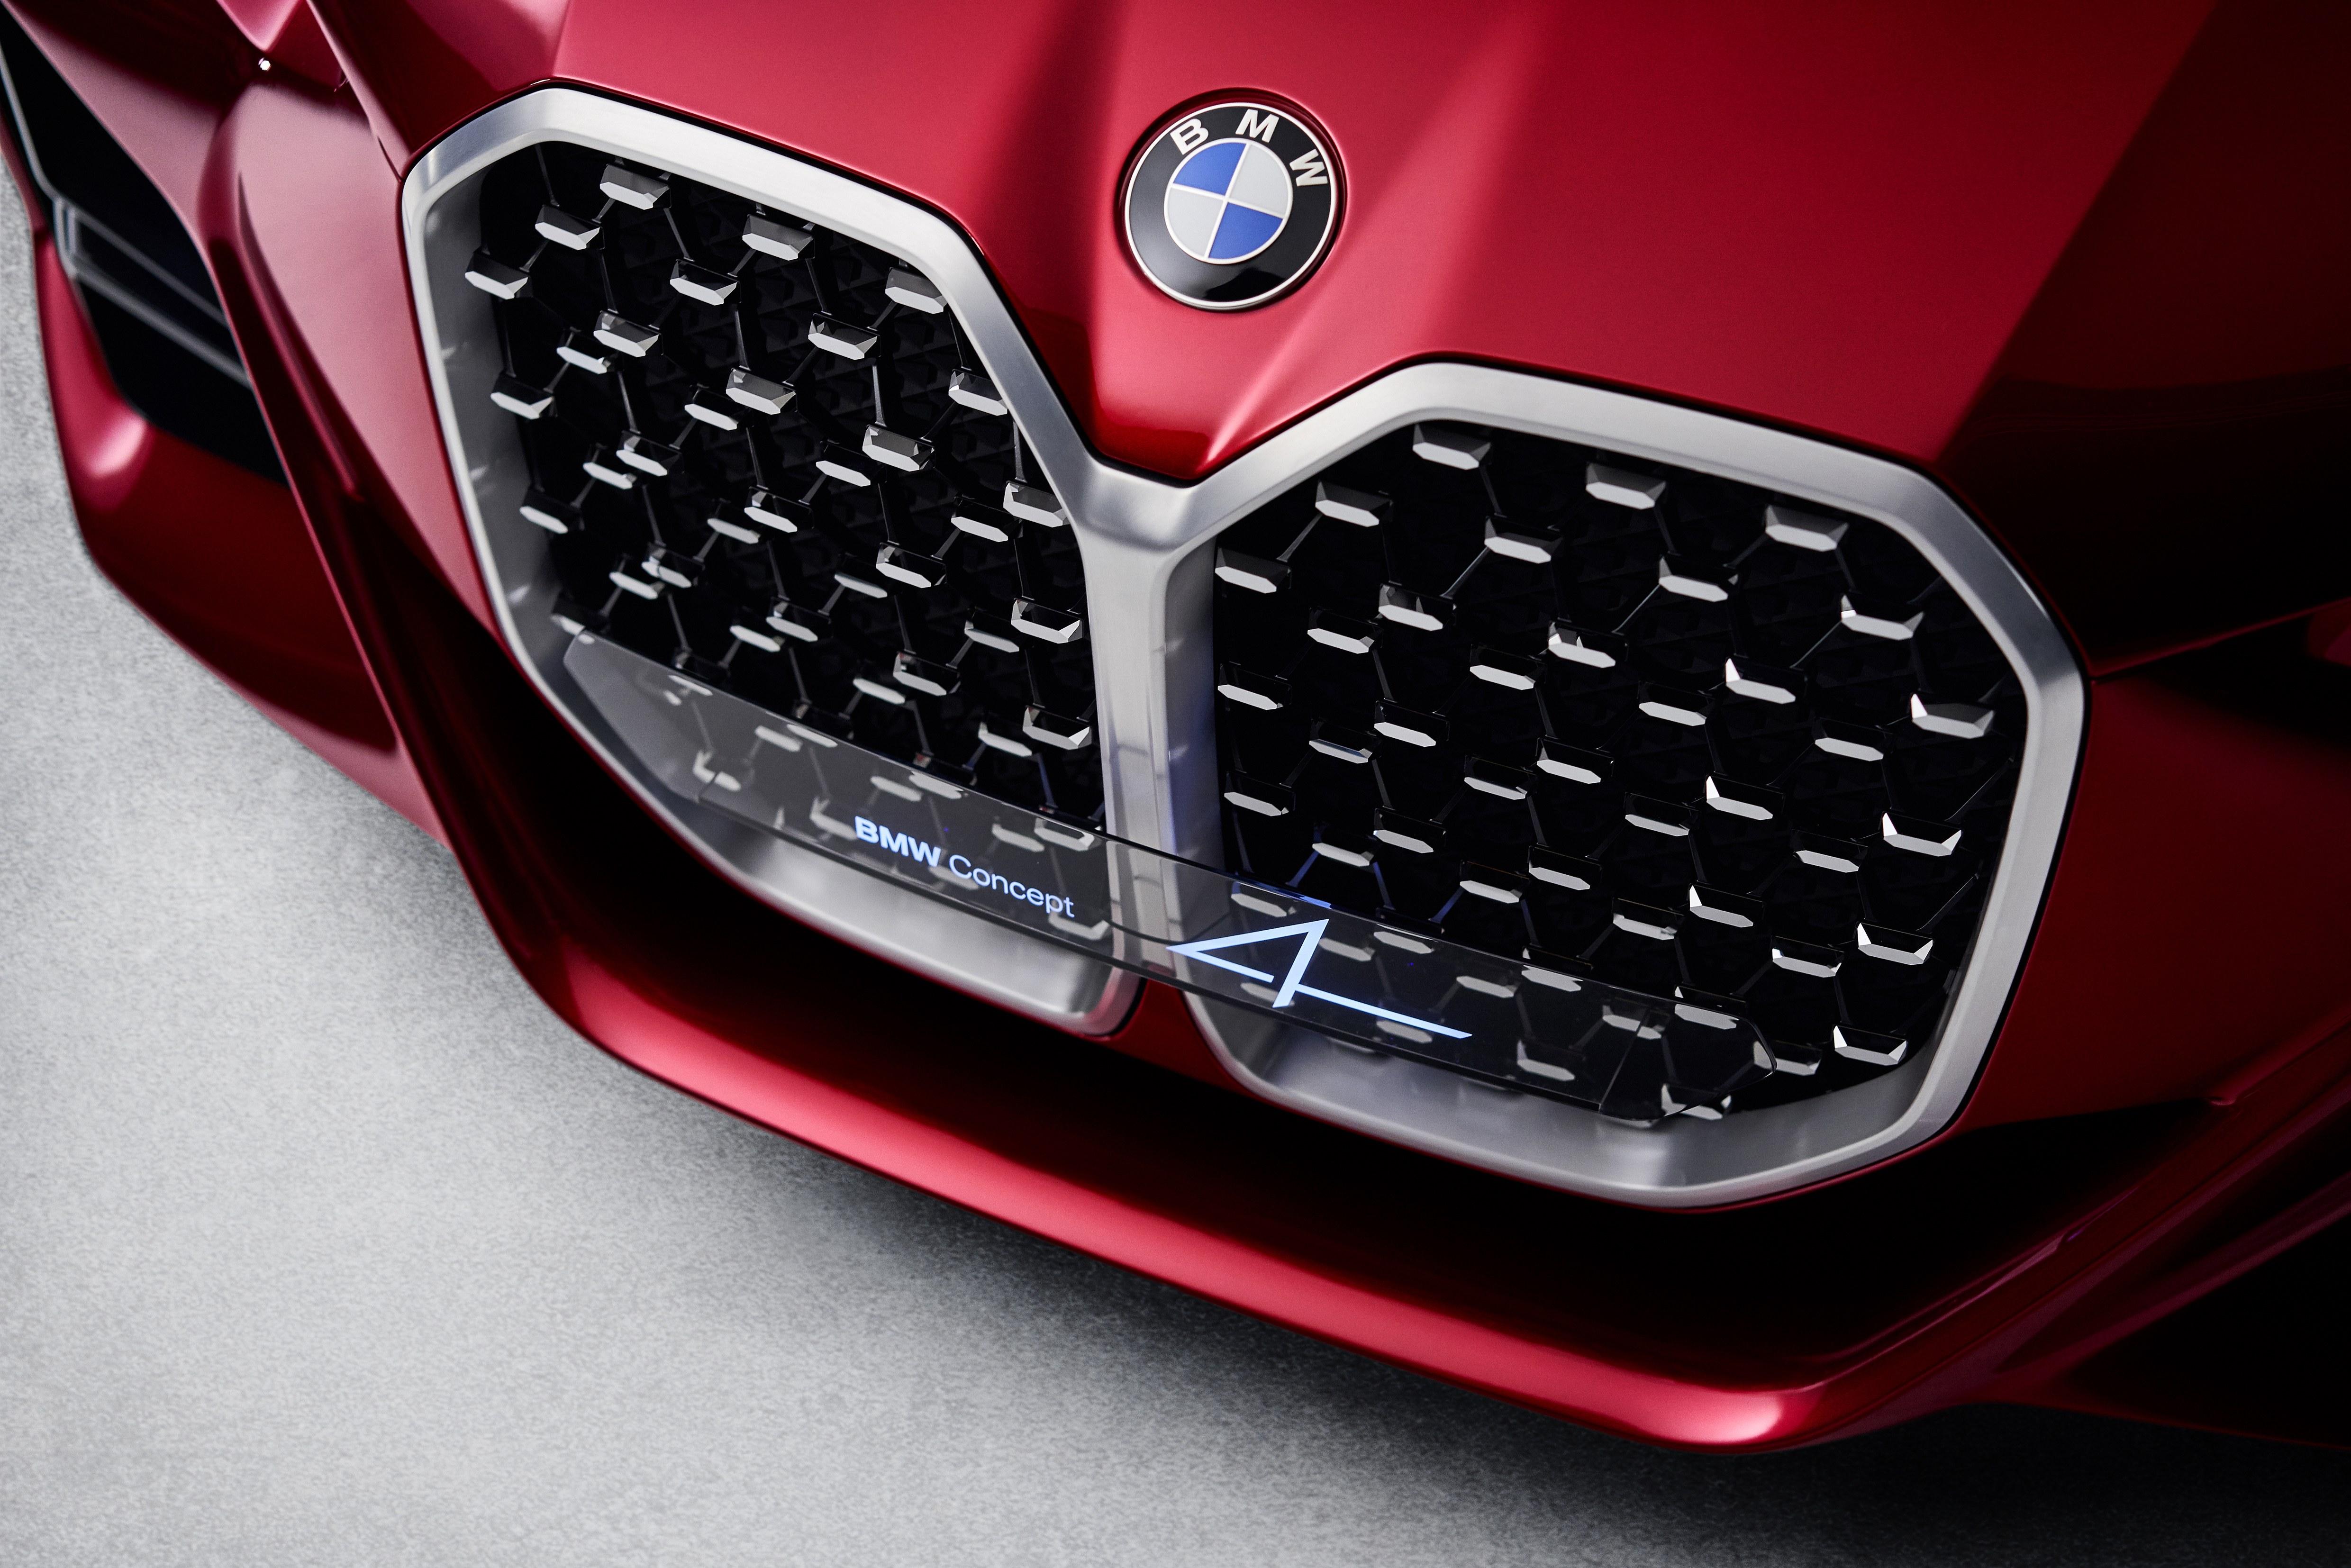 BMWのフロントグリルは大型化が止まらない! コンセプト4登場